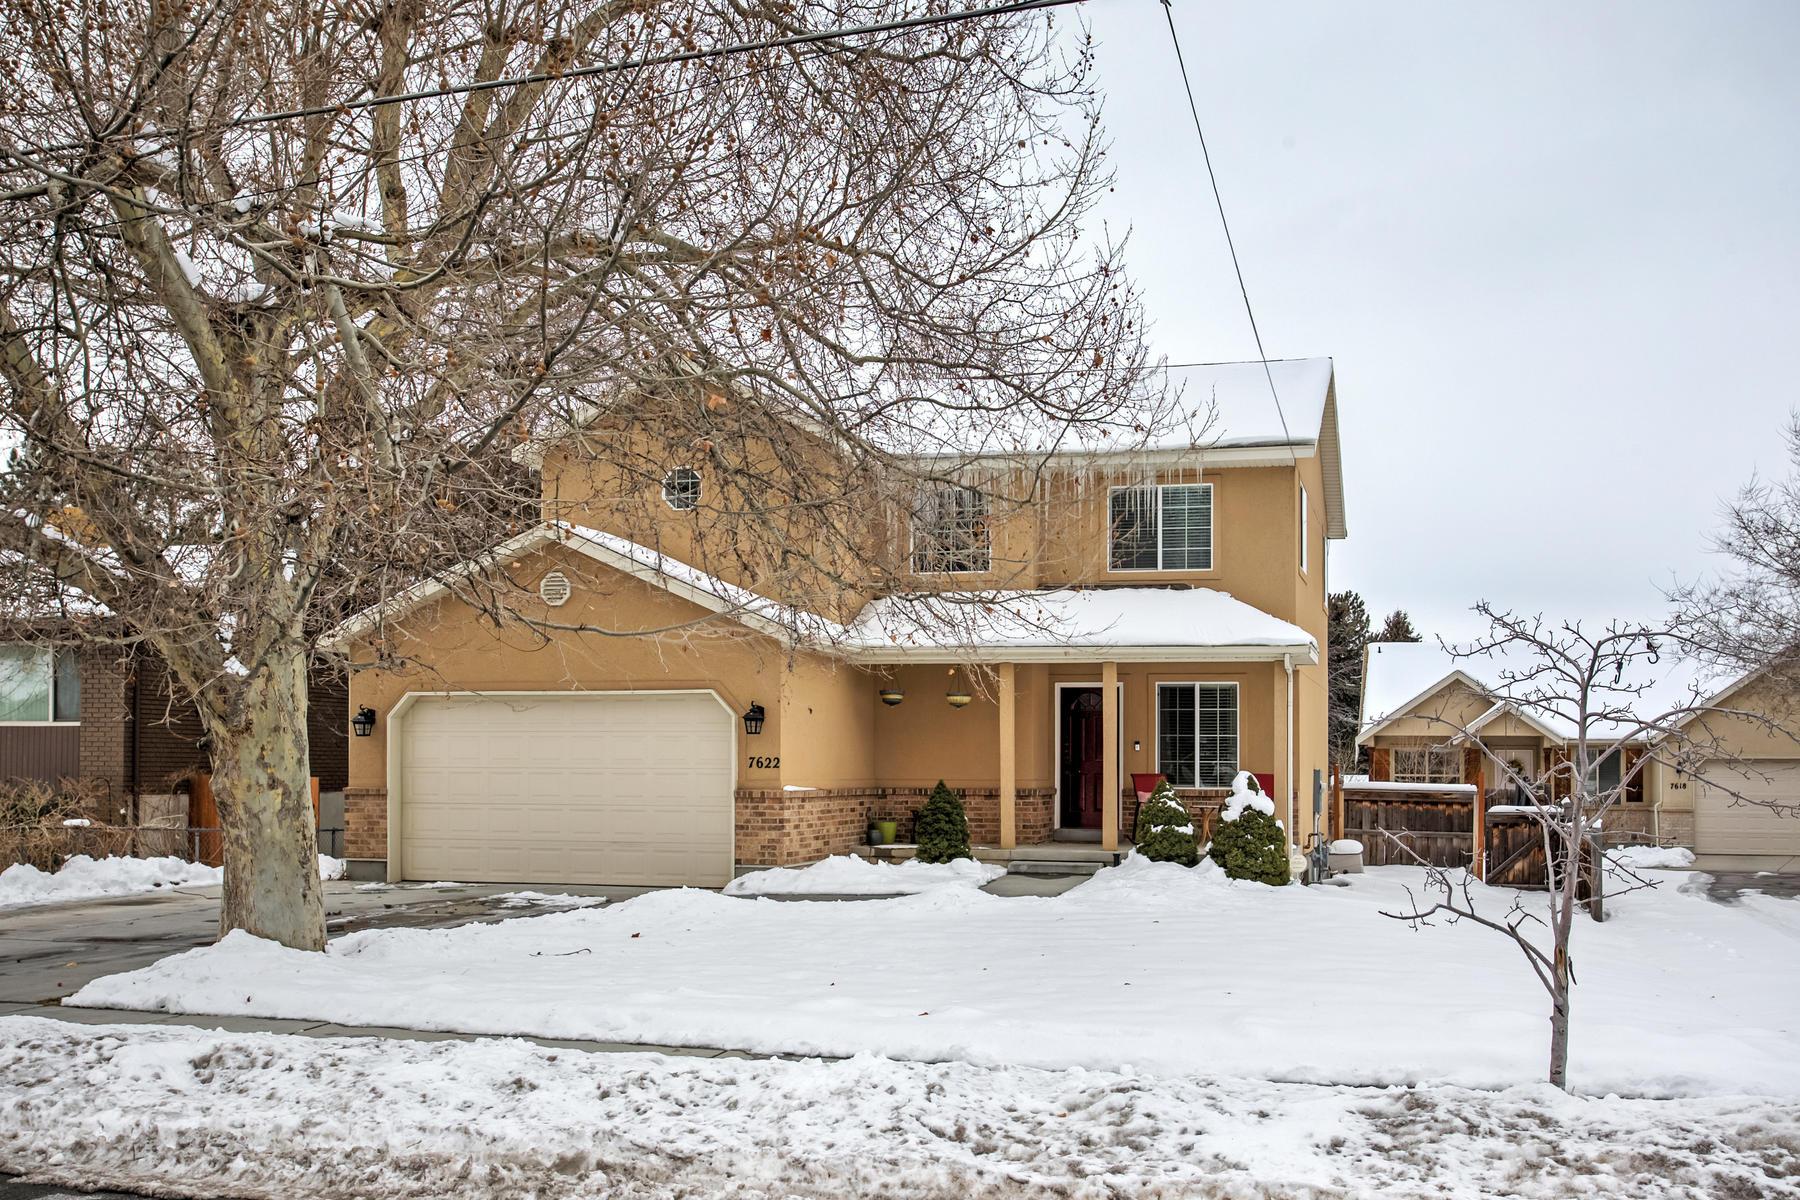 Частный односемейный дом для того Продажа на Immaculate and Centrally Located Home 7622 South 1000 East, Midvale, Юта, 84047 Соединенные Штаты